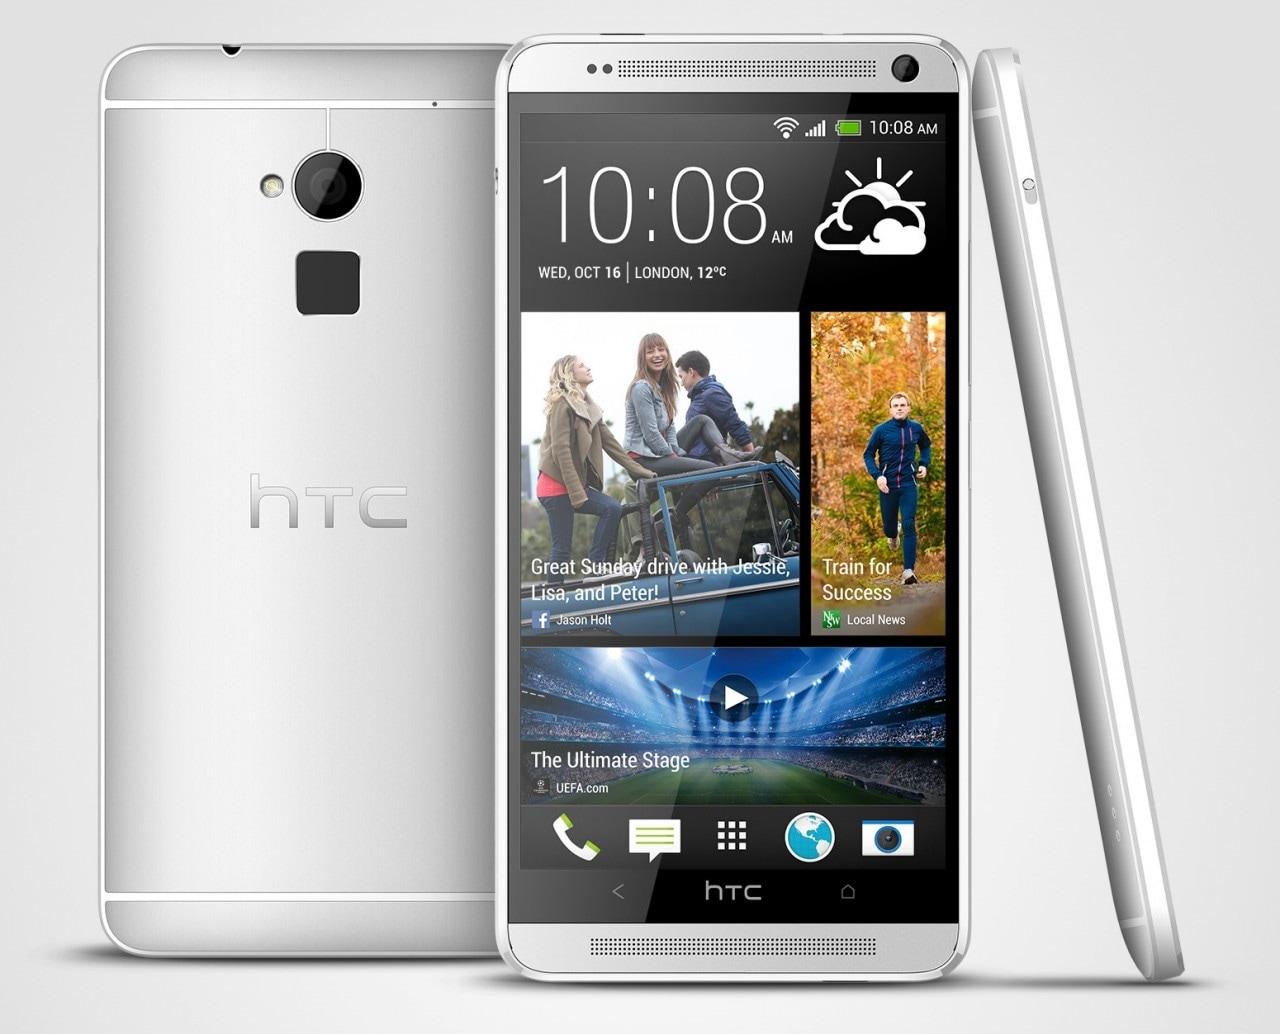 HTC-One-max-Glacial-Silver-3V